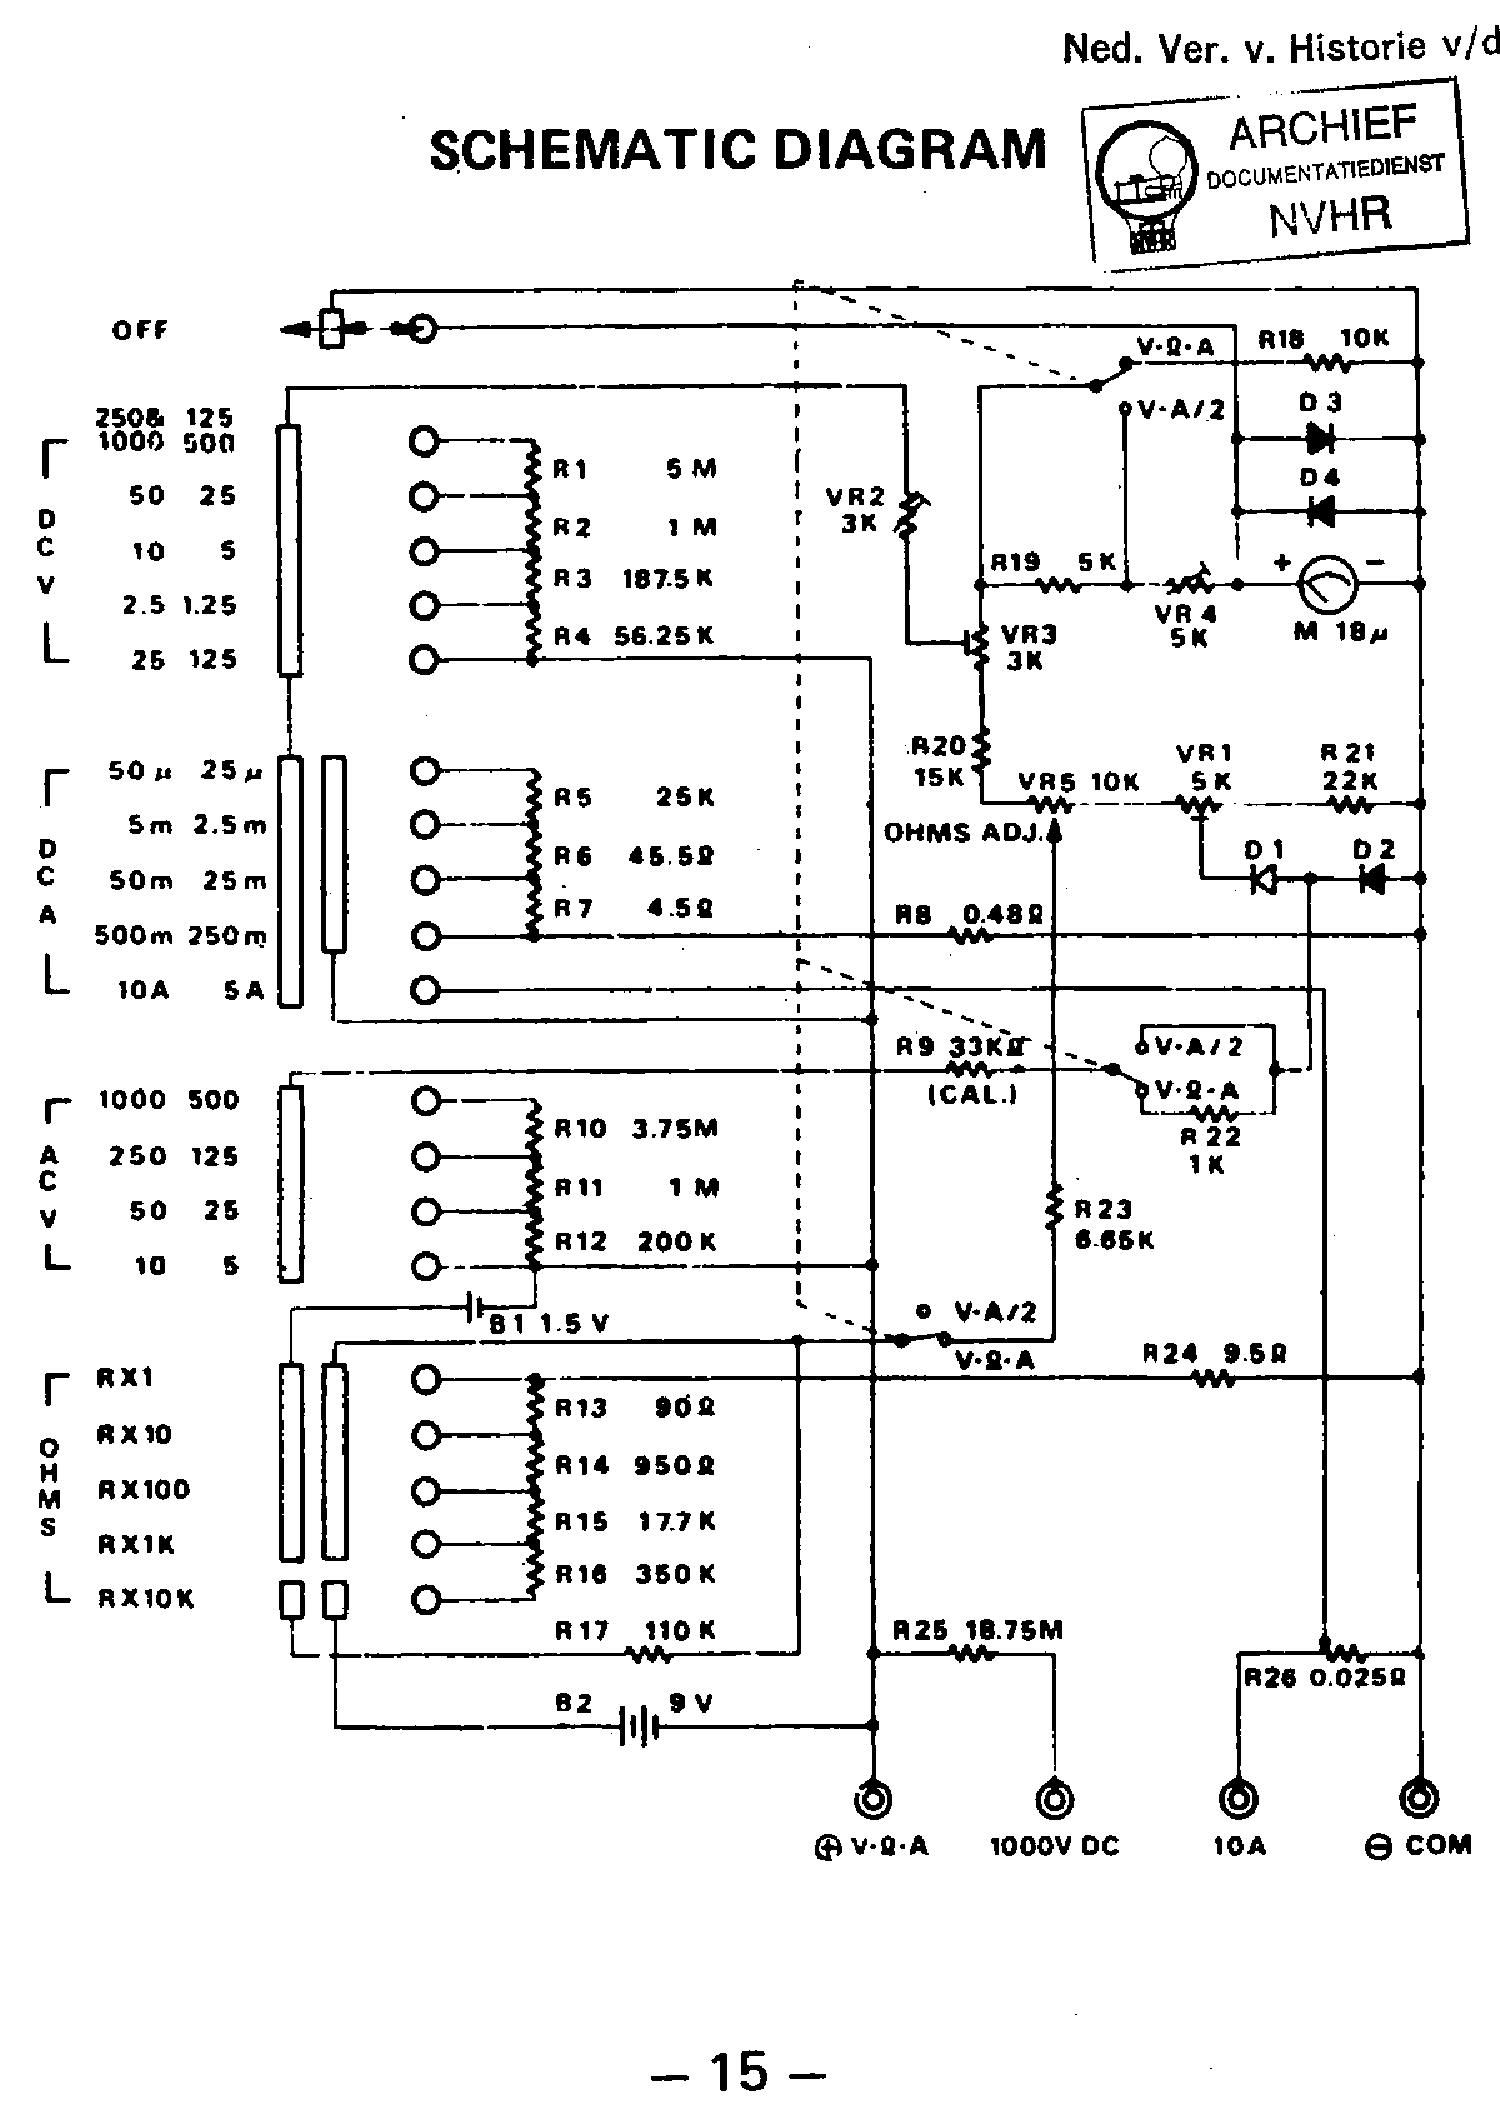 micronta_22 204_analog mm_sch.pdf_1 micronta 22 204 analog mm sch service manual download, schematics  at bakdesigns.co